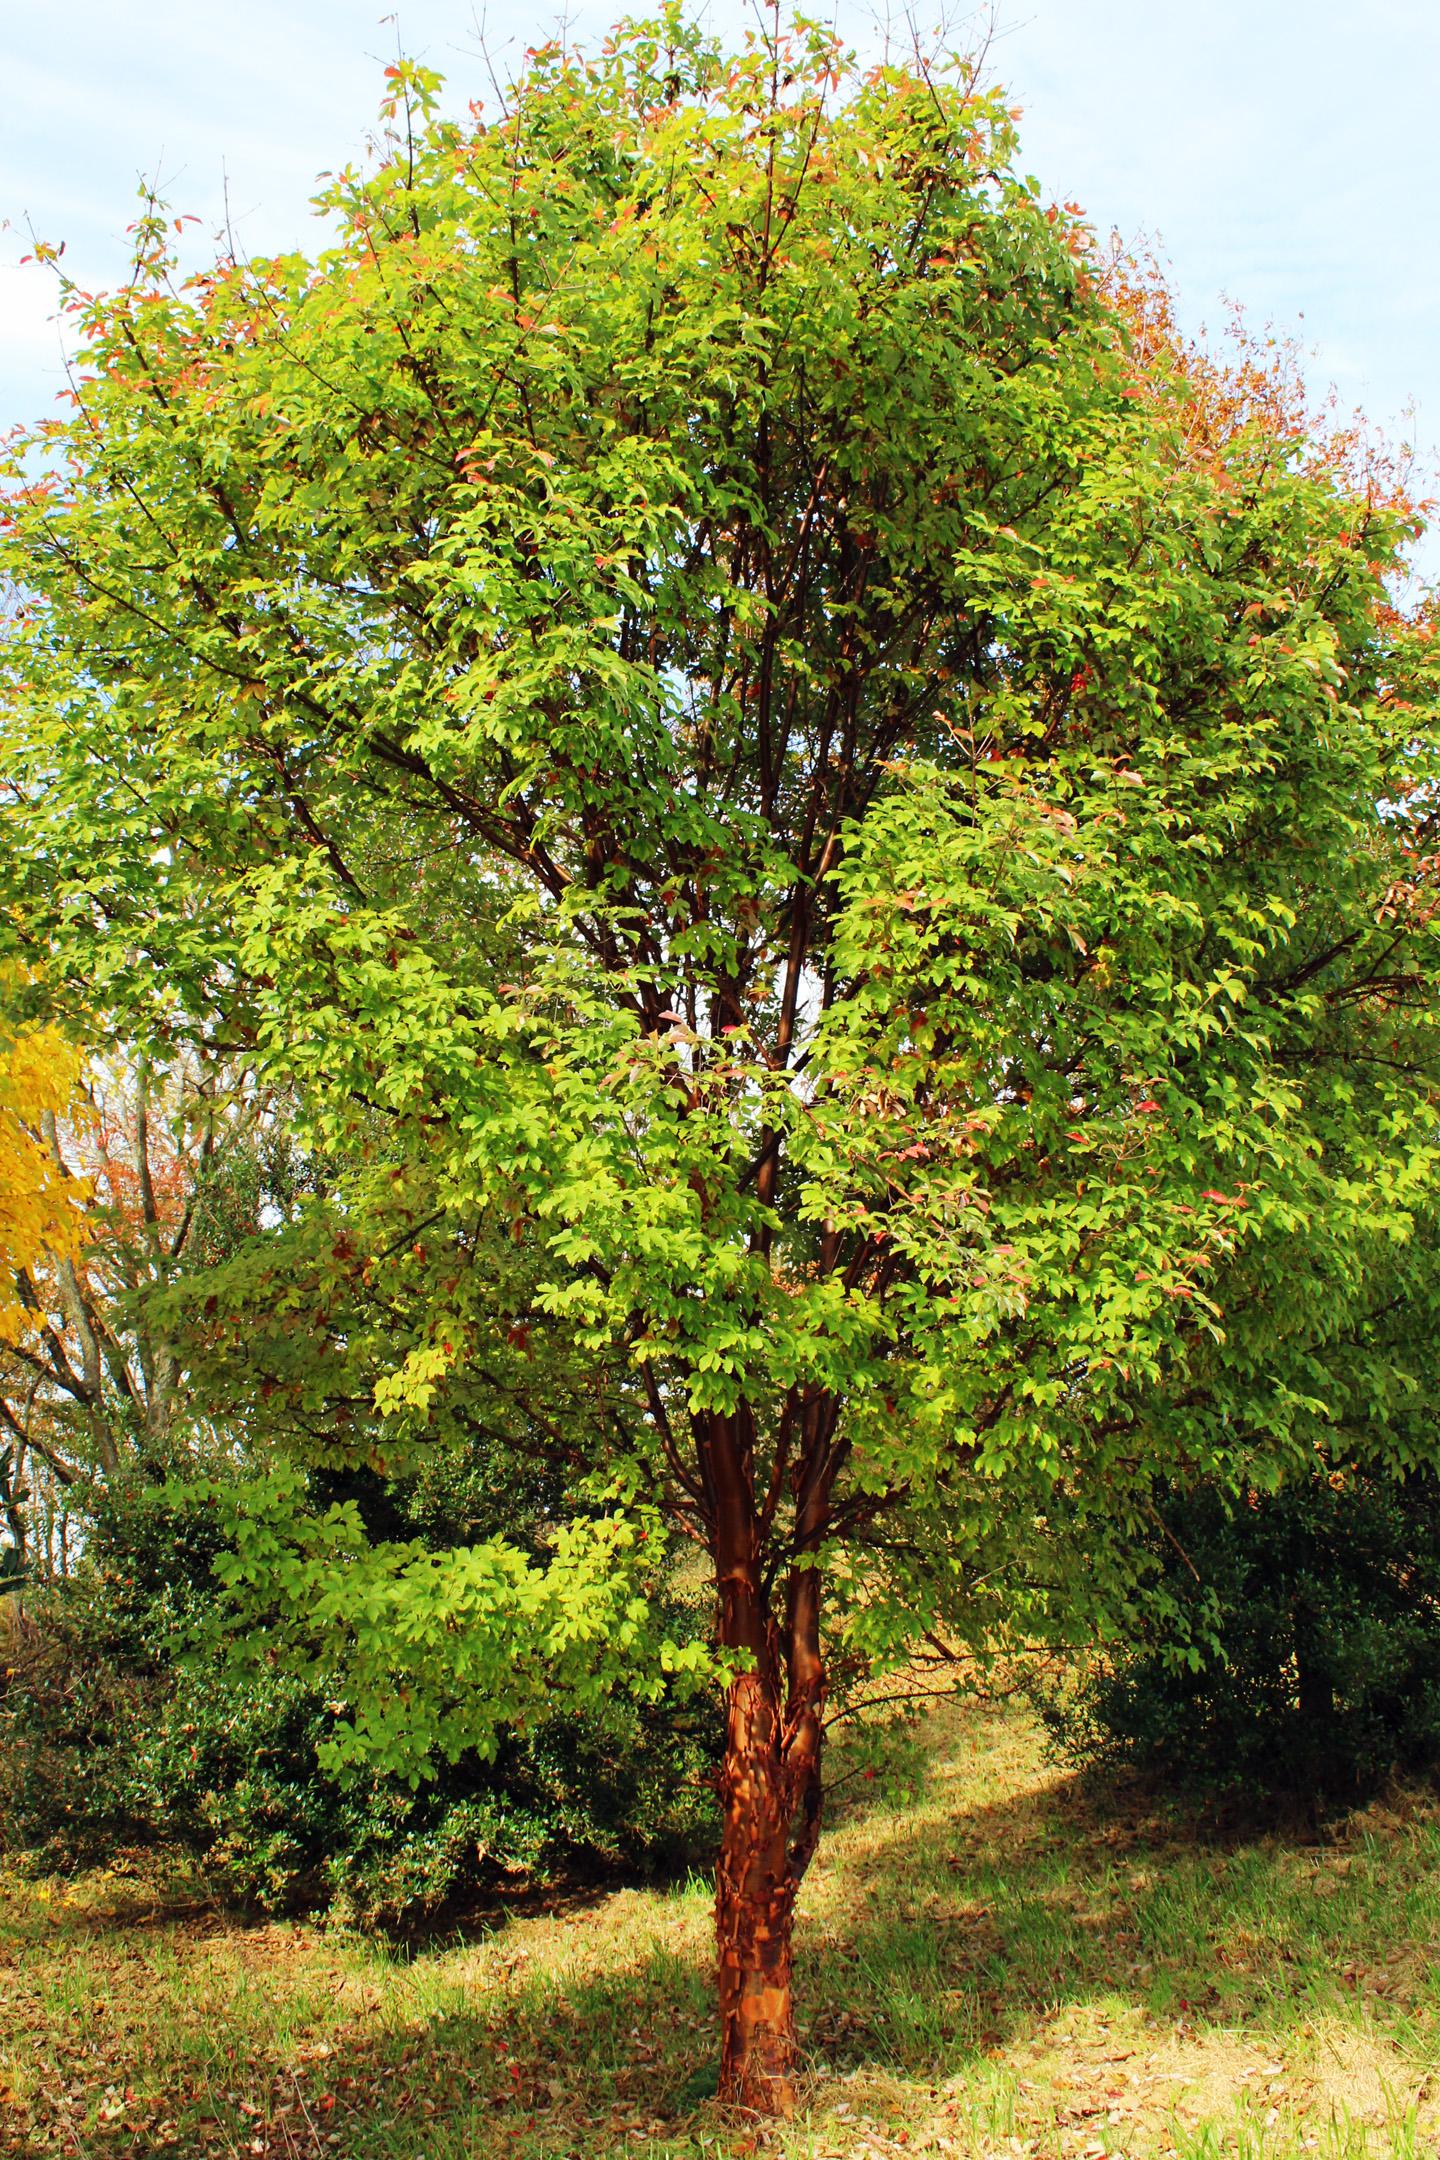 Trees We Love - Paperbark Maple